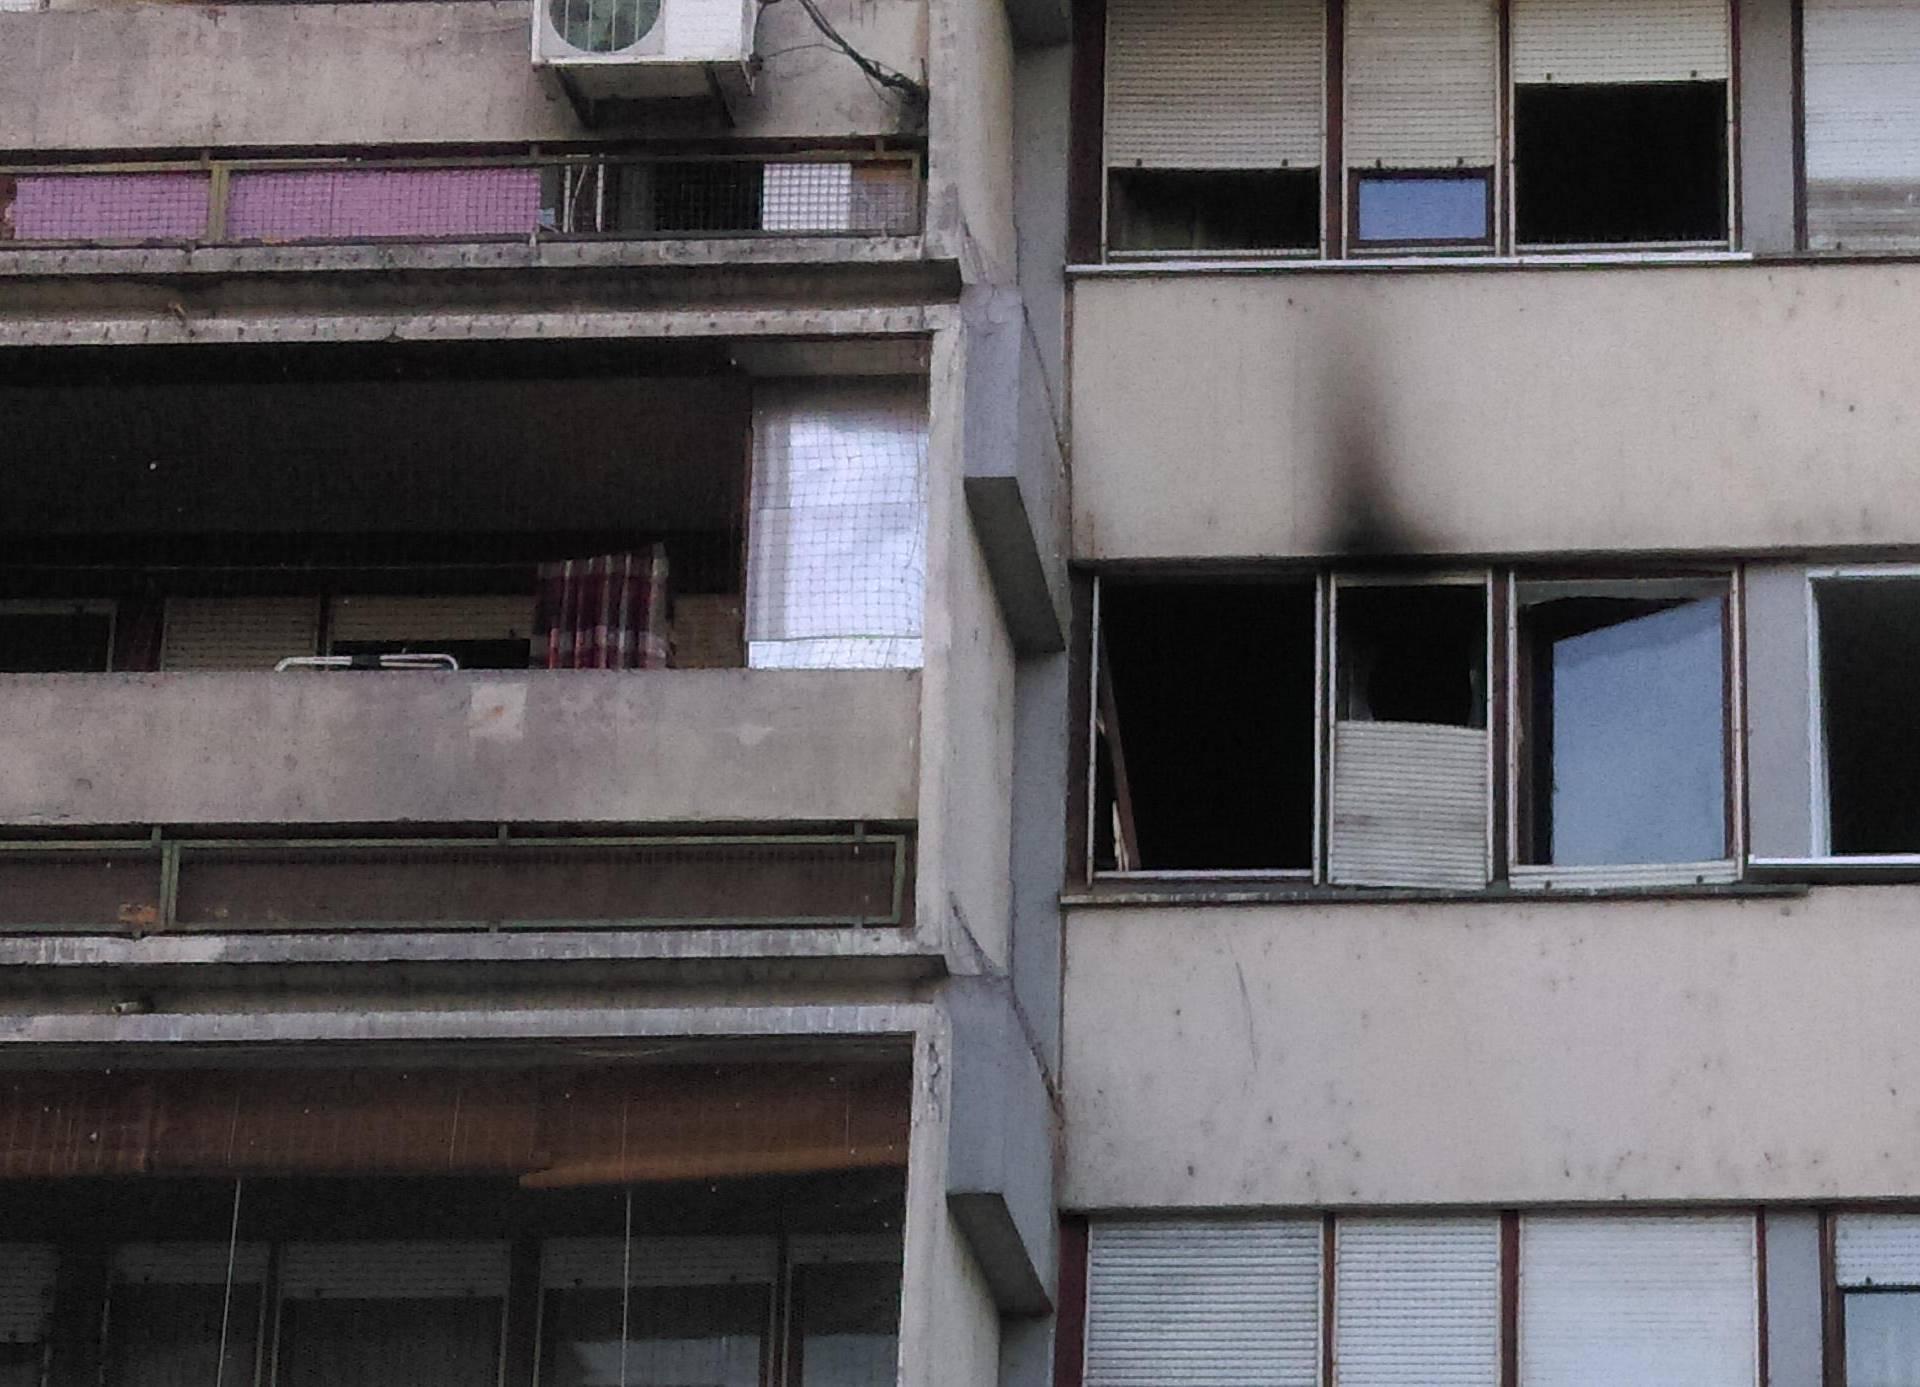 Planuo stan na zagrebačkom Prisavlju: Kriv je kratki spoj?